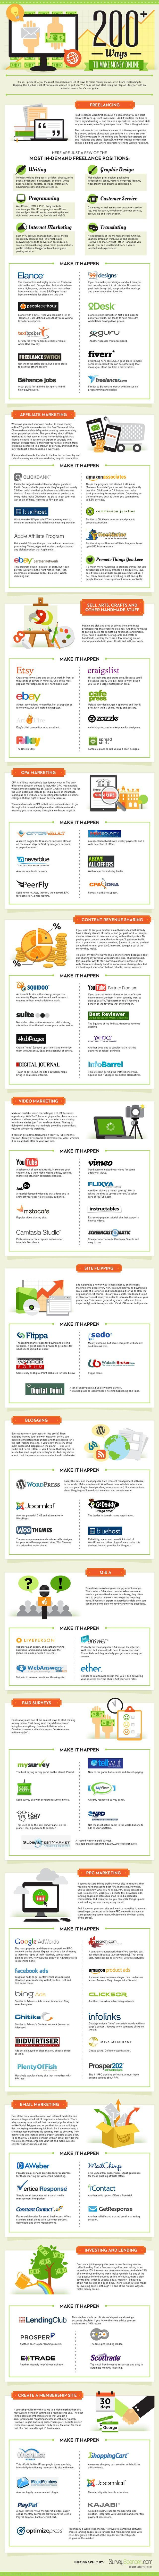 200 Ways to Make Money From the Internet. #digital #Marketing